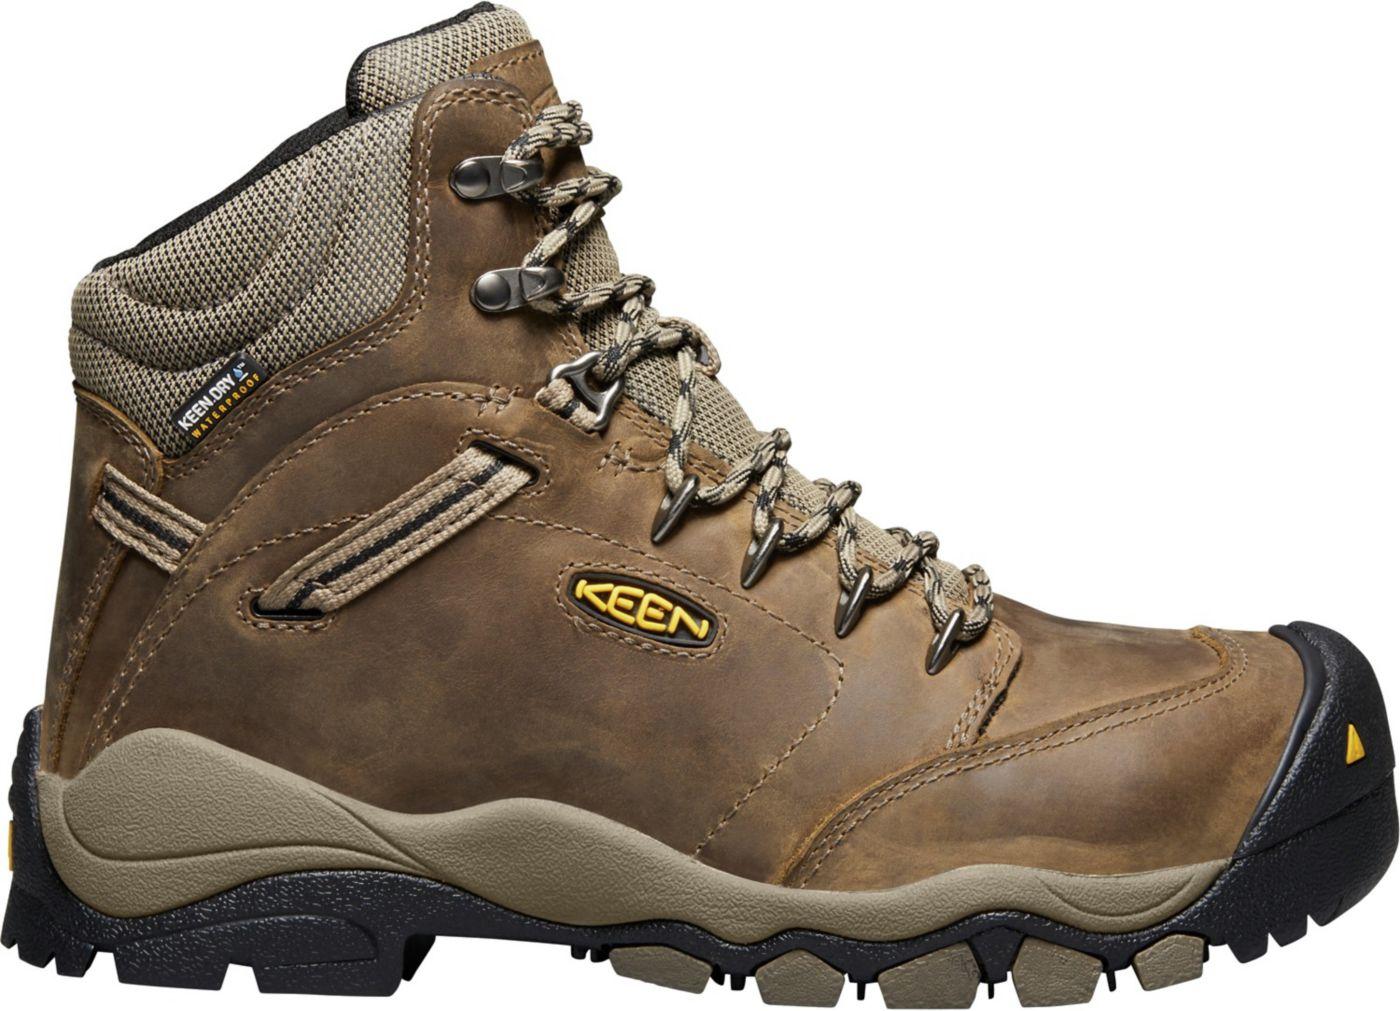 KEEN Women's Canby 6'' Aluminum Toe Waterproof Work Boots